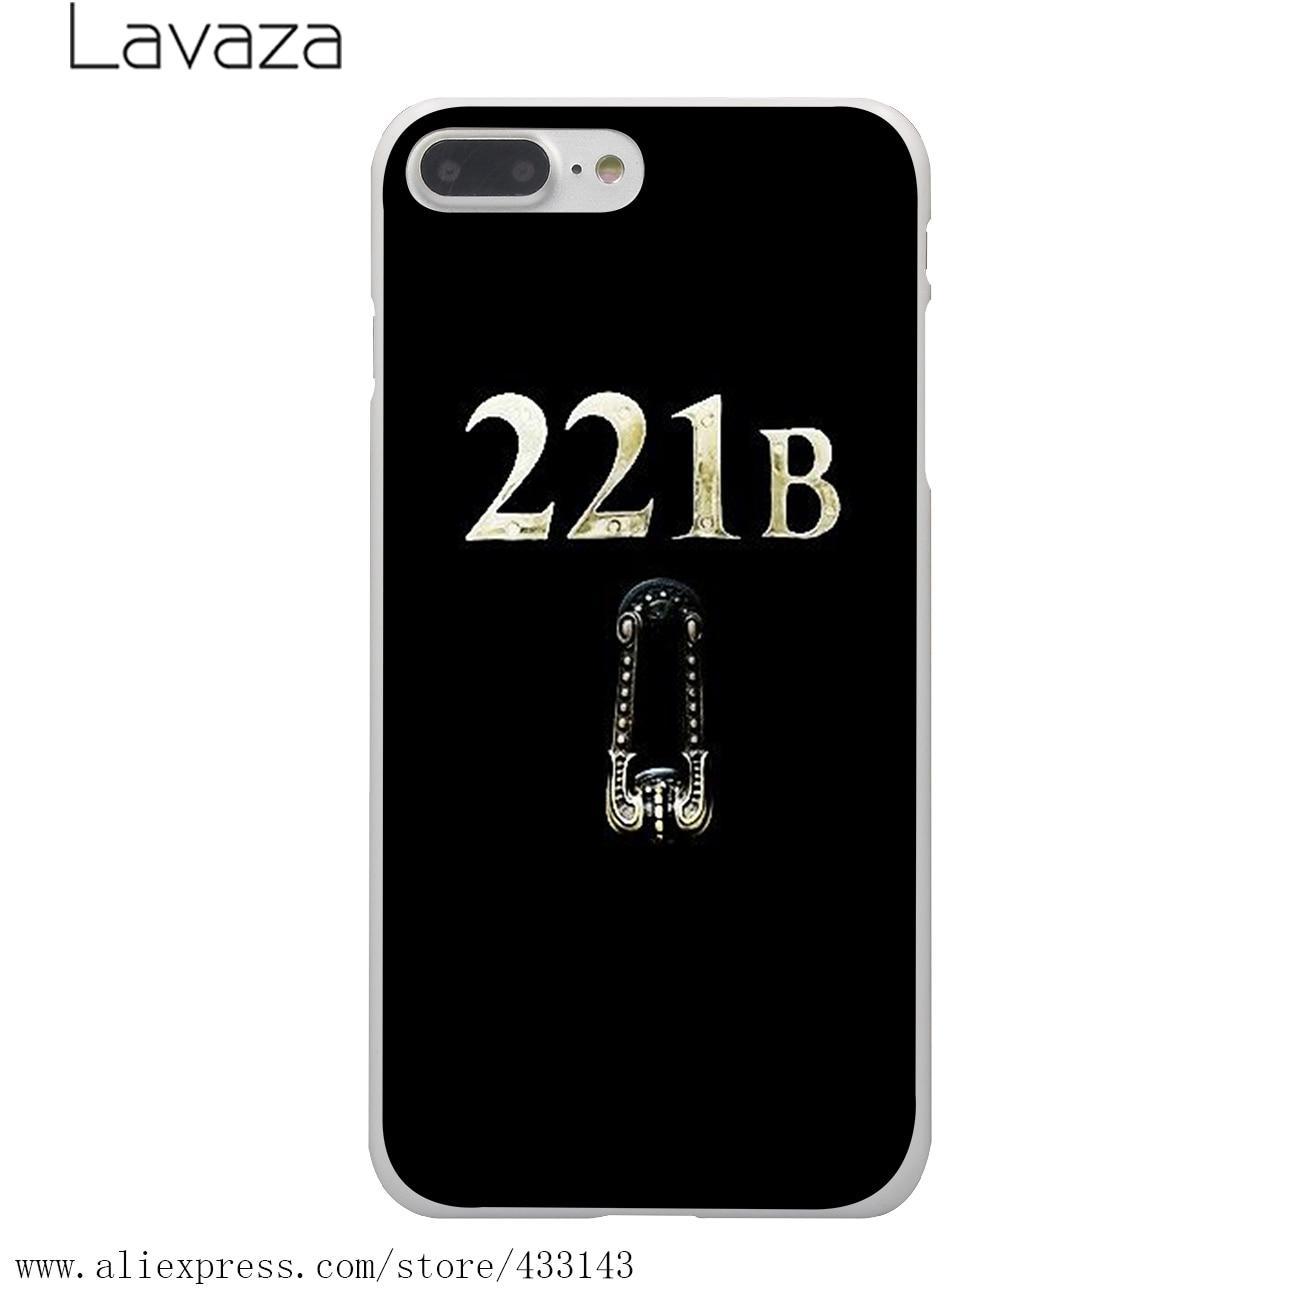 coque iphone 7 sherlock